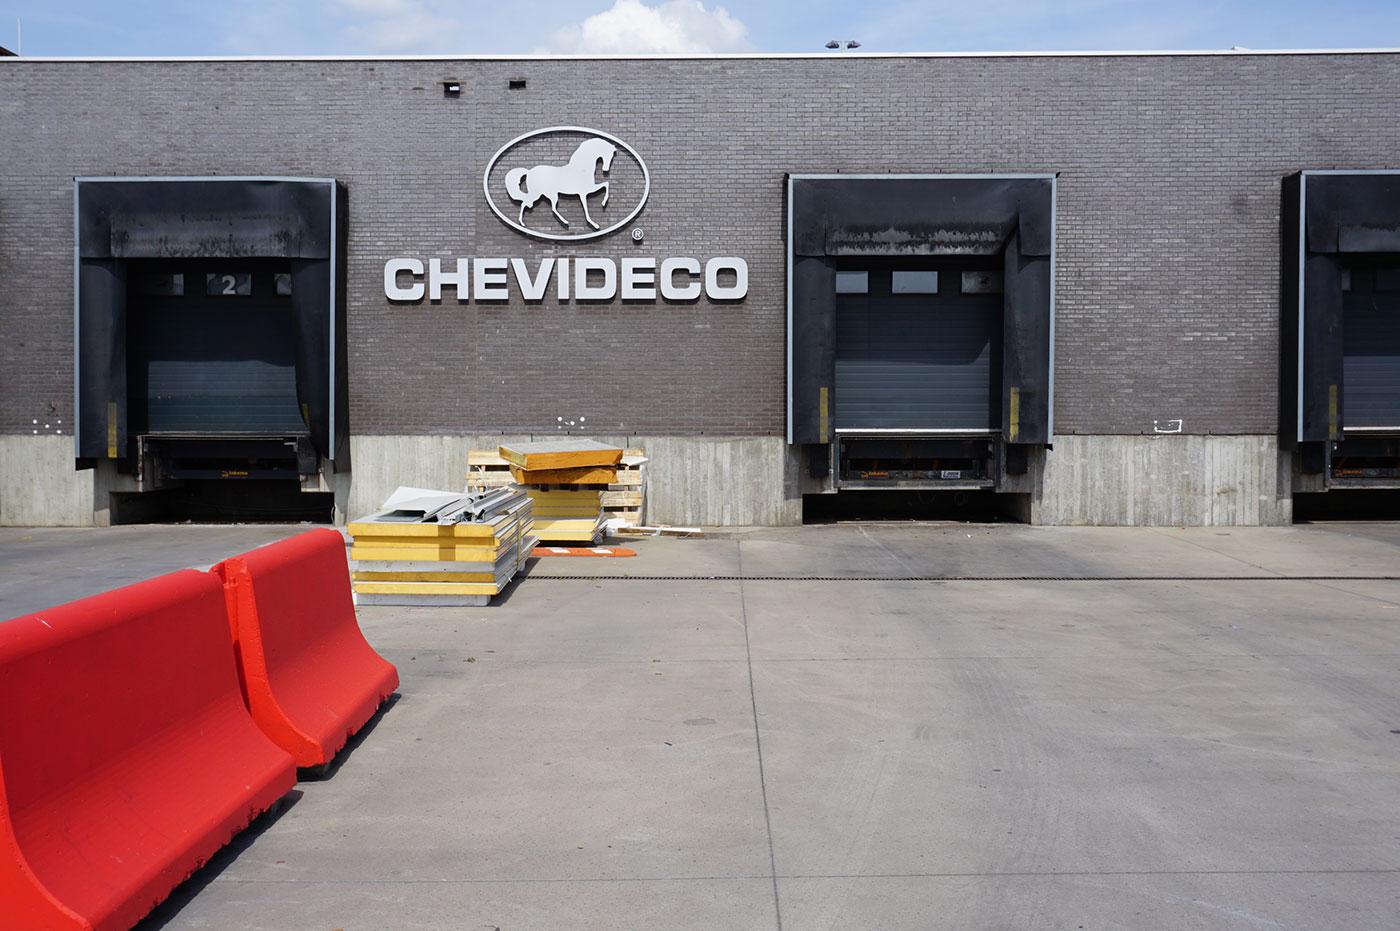 Sediul Chevideco din Menen, Belgia